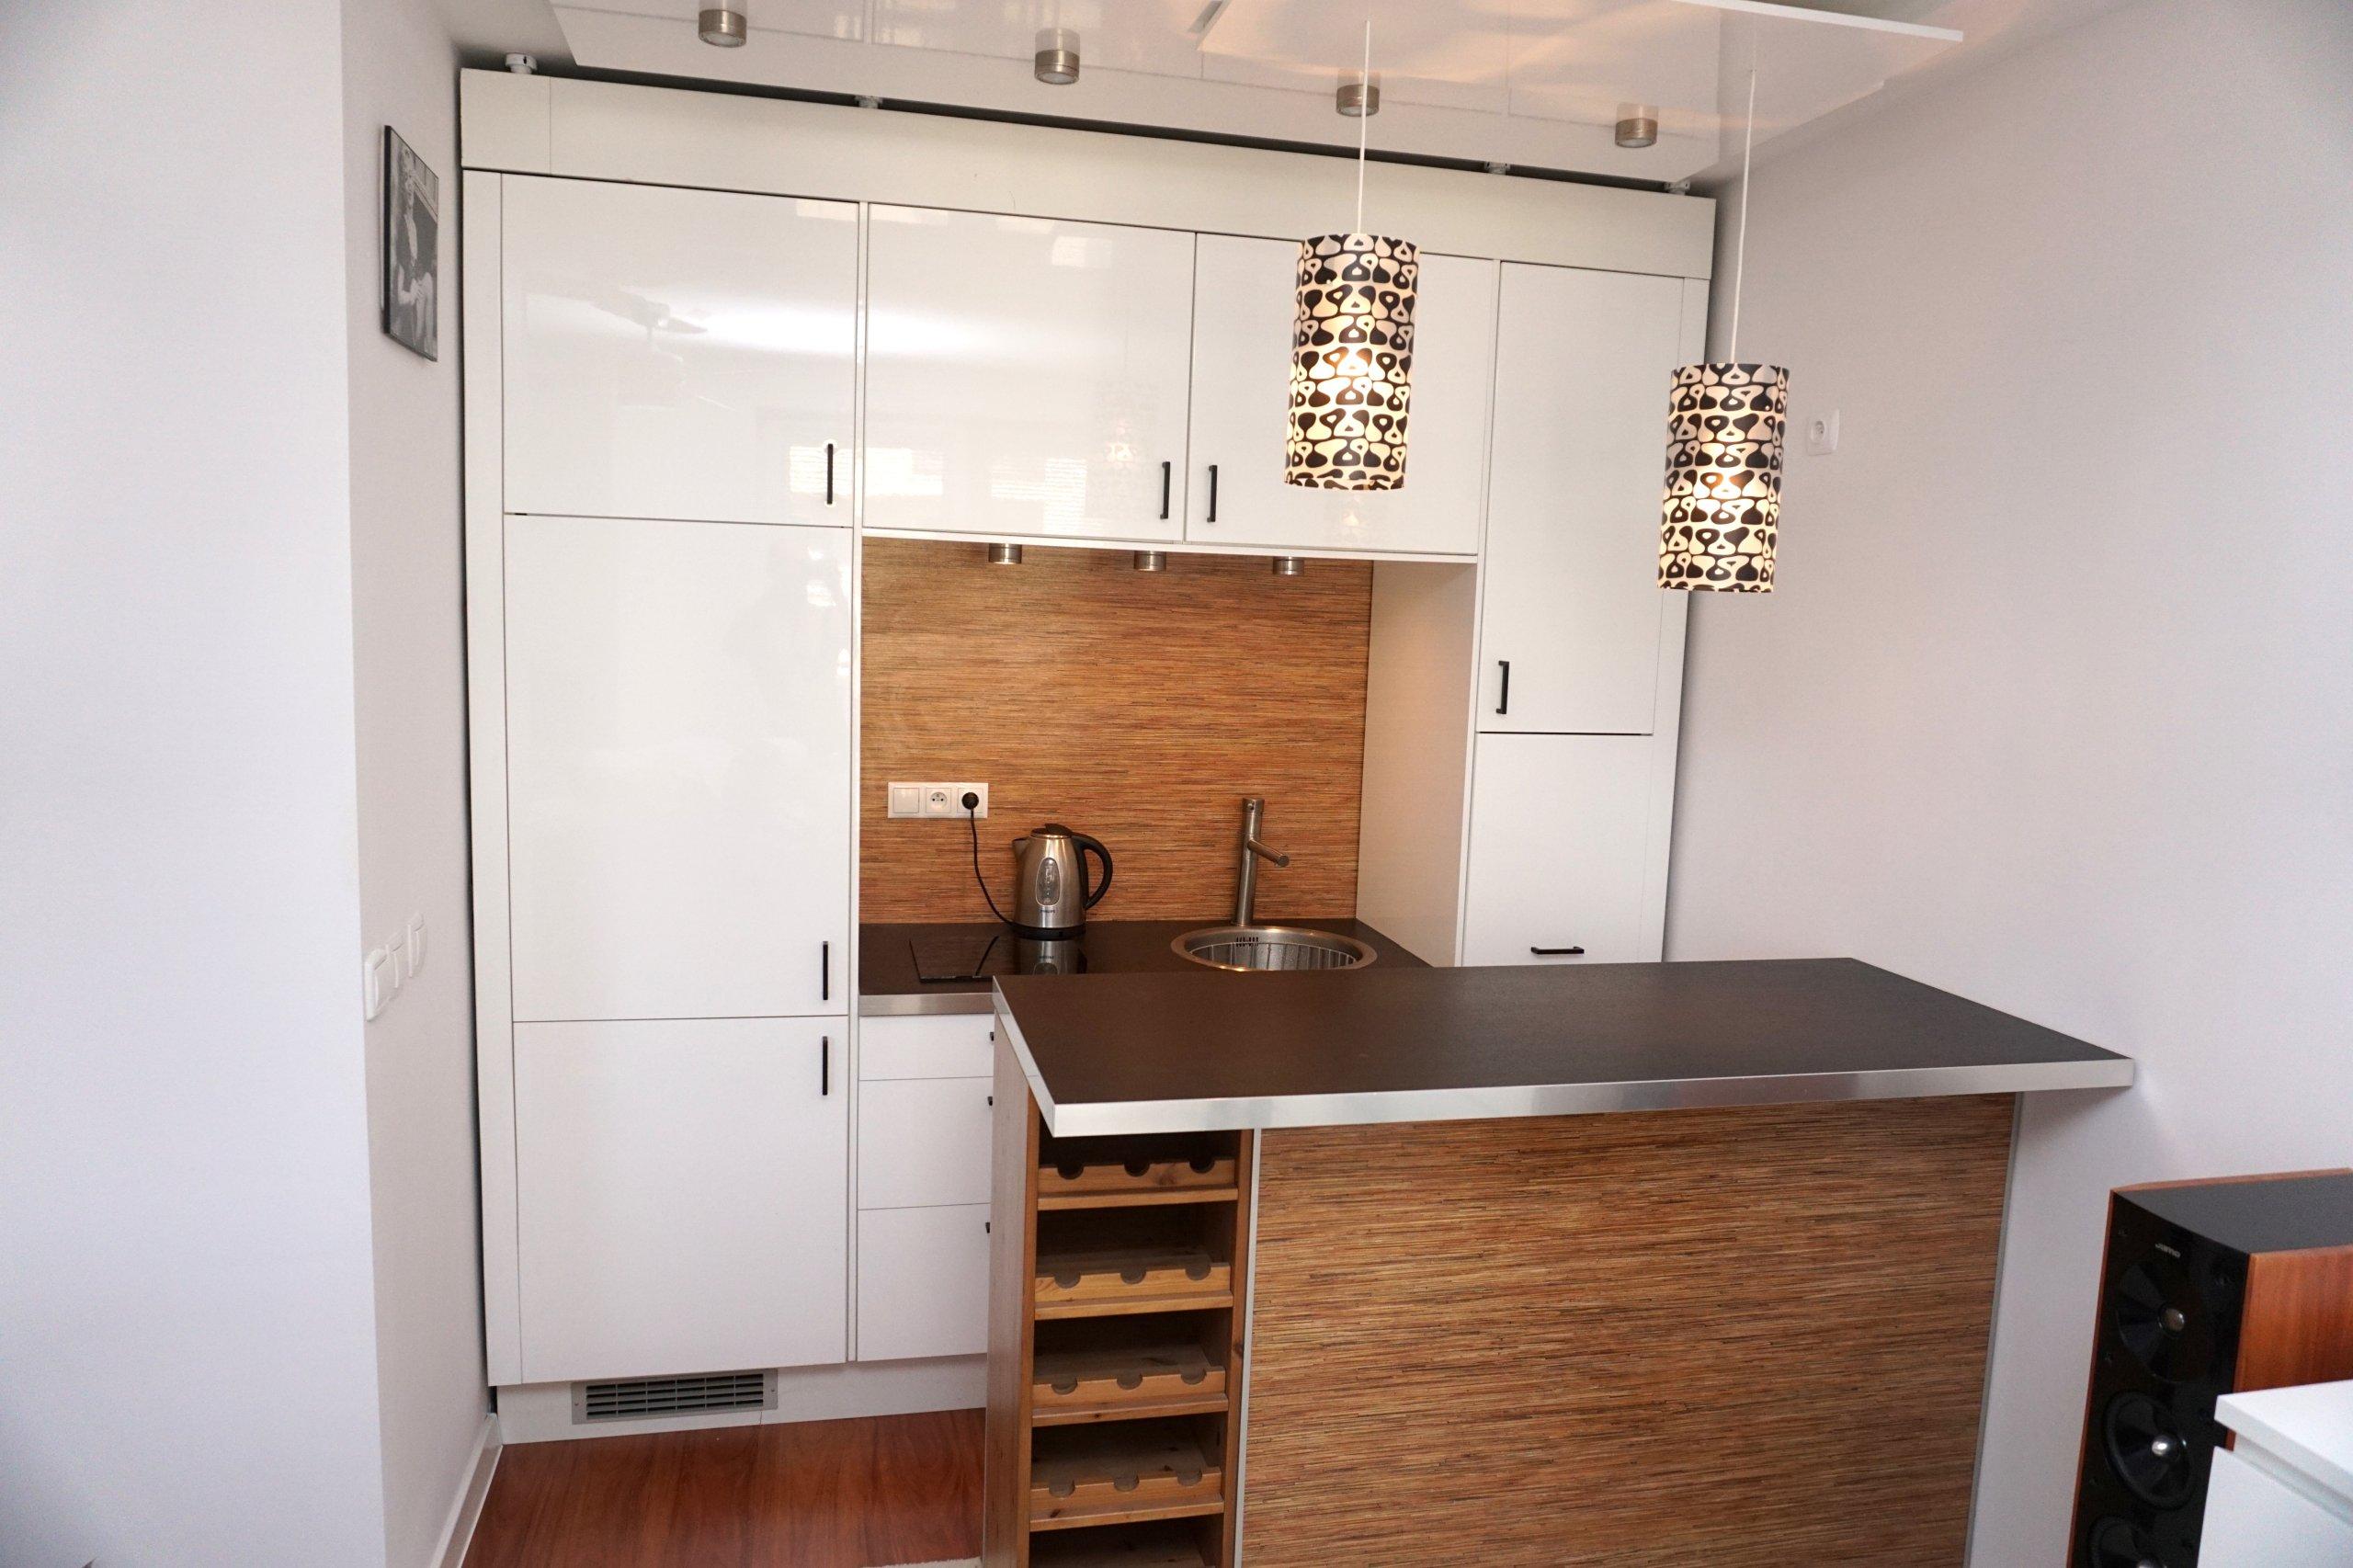 Meble Kuchenne Zestaw Ikea Kompletna Kuchnia Agd 7365581691